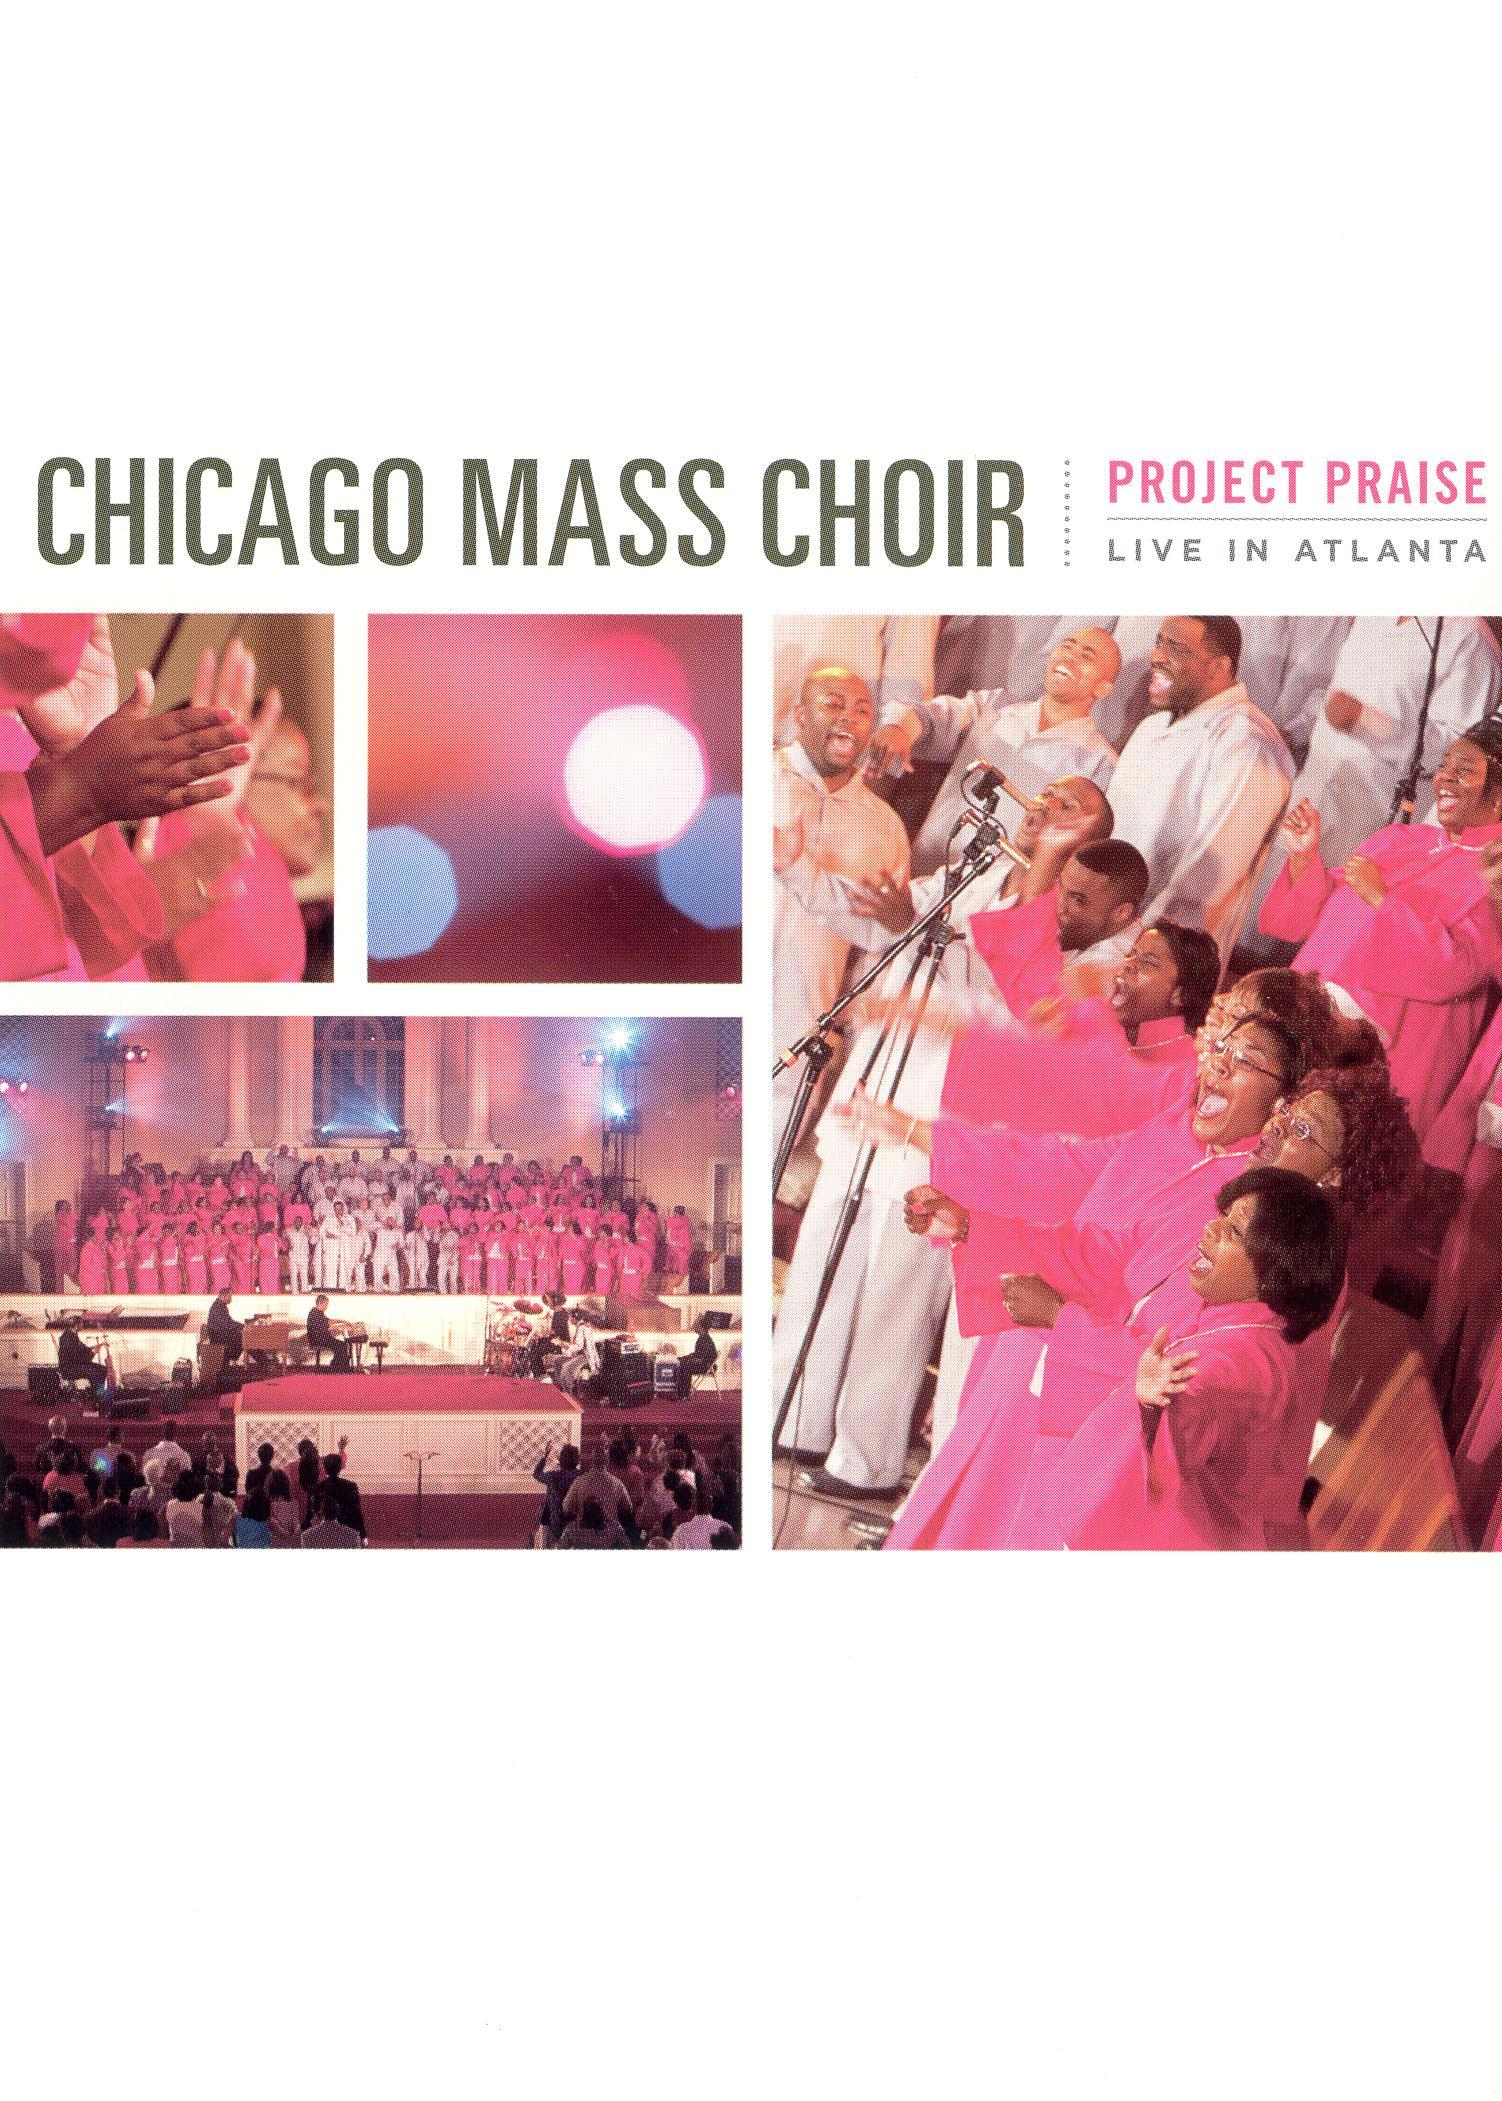 Chicago Mass Choir: Project Praise - Live in Atlanta